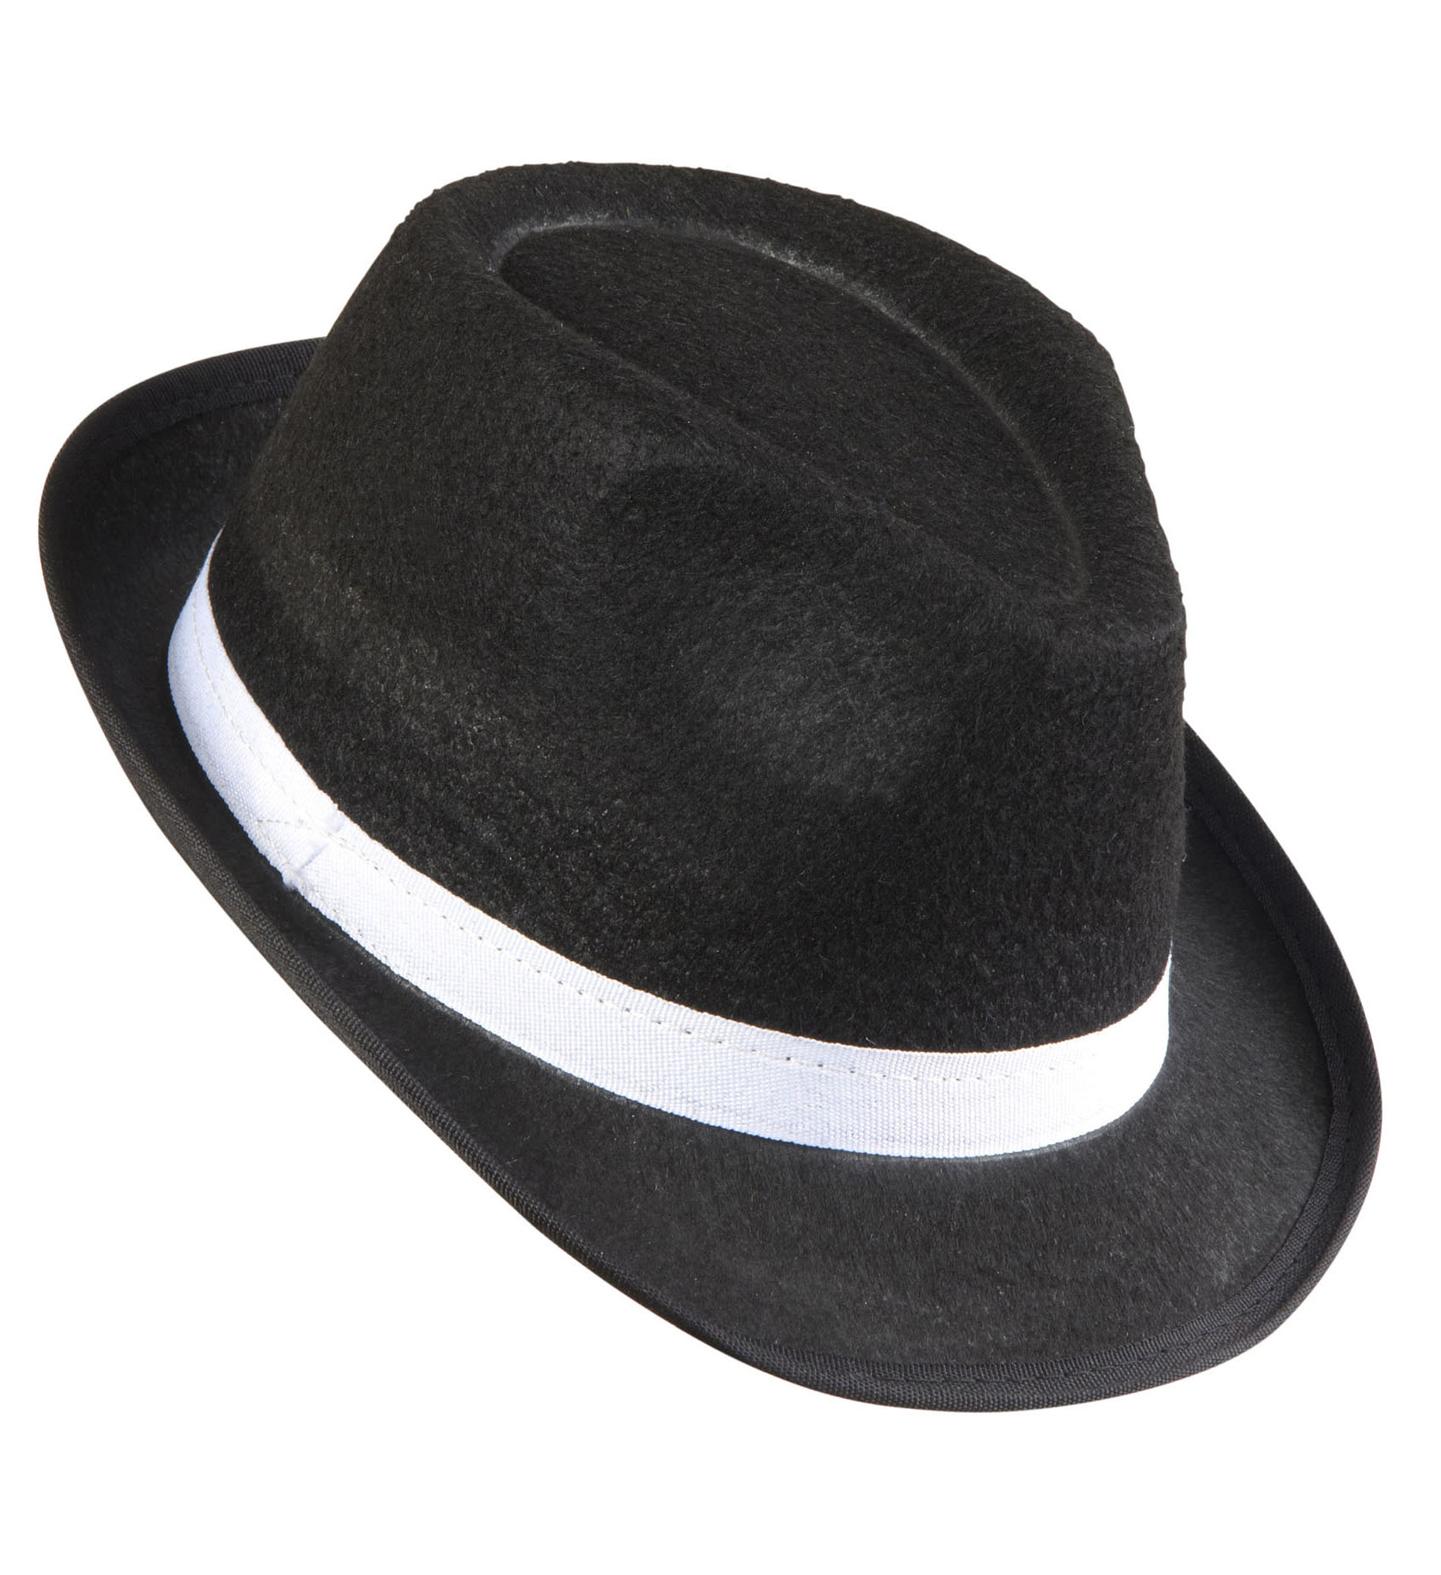 Gangster Hat Felt Black Felt Hat 20s 30s Fancy Dress